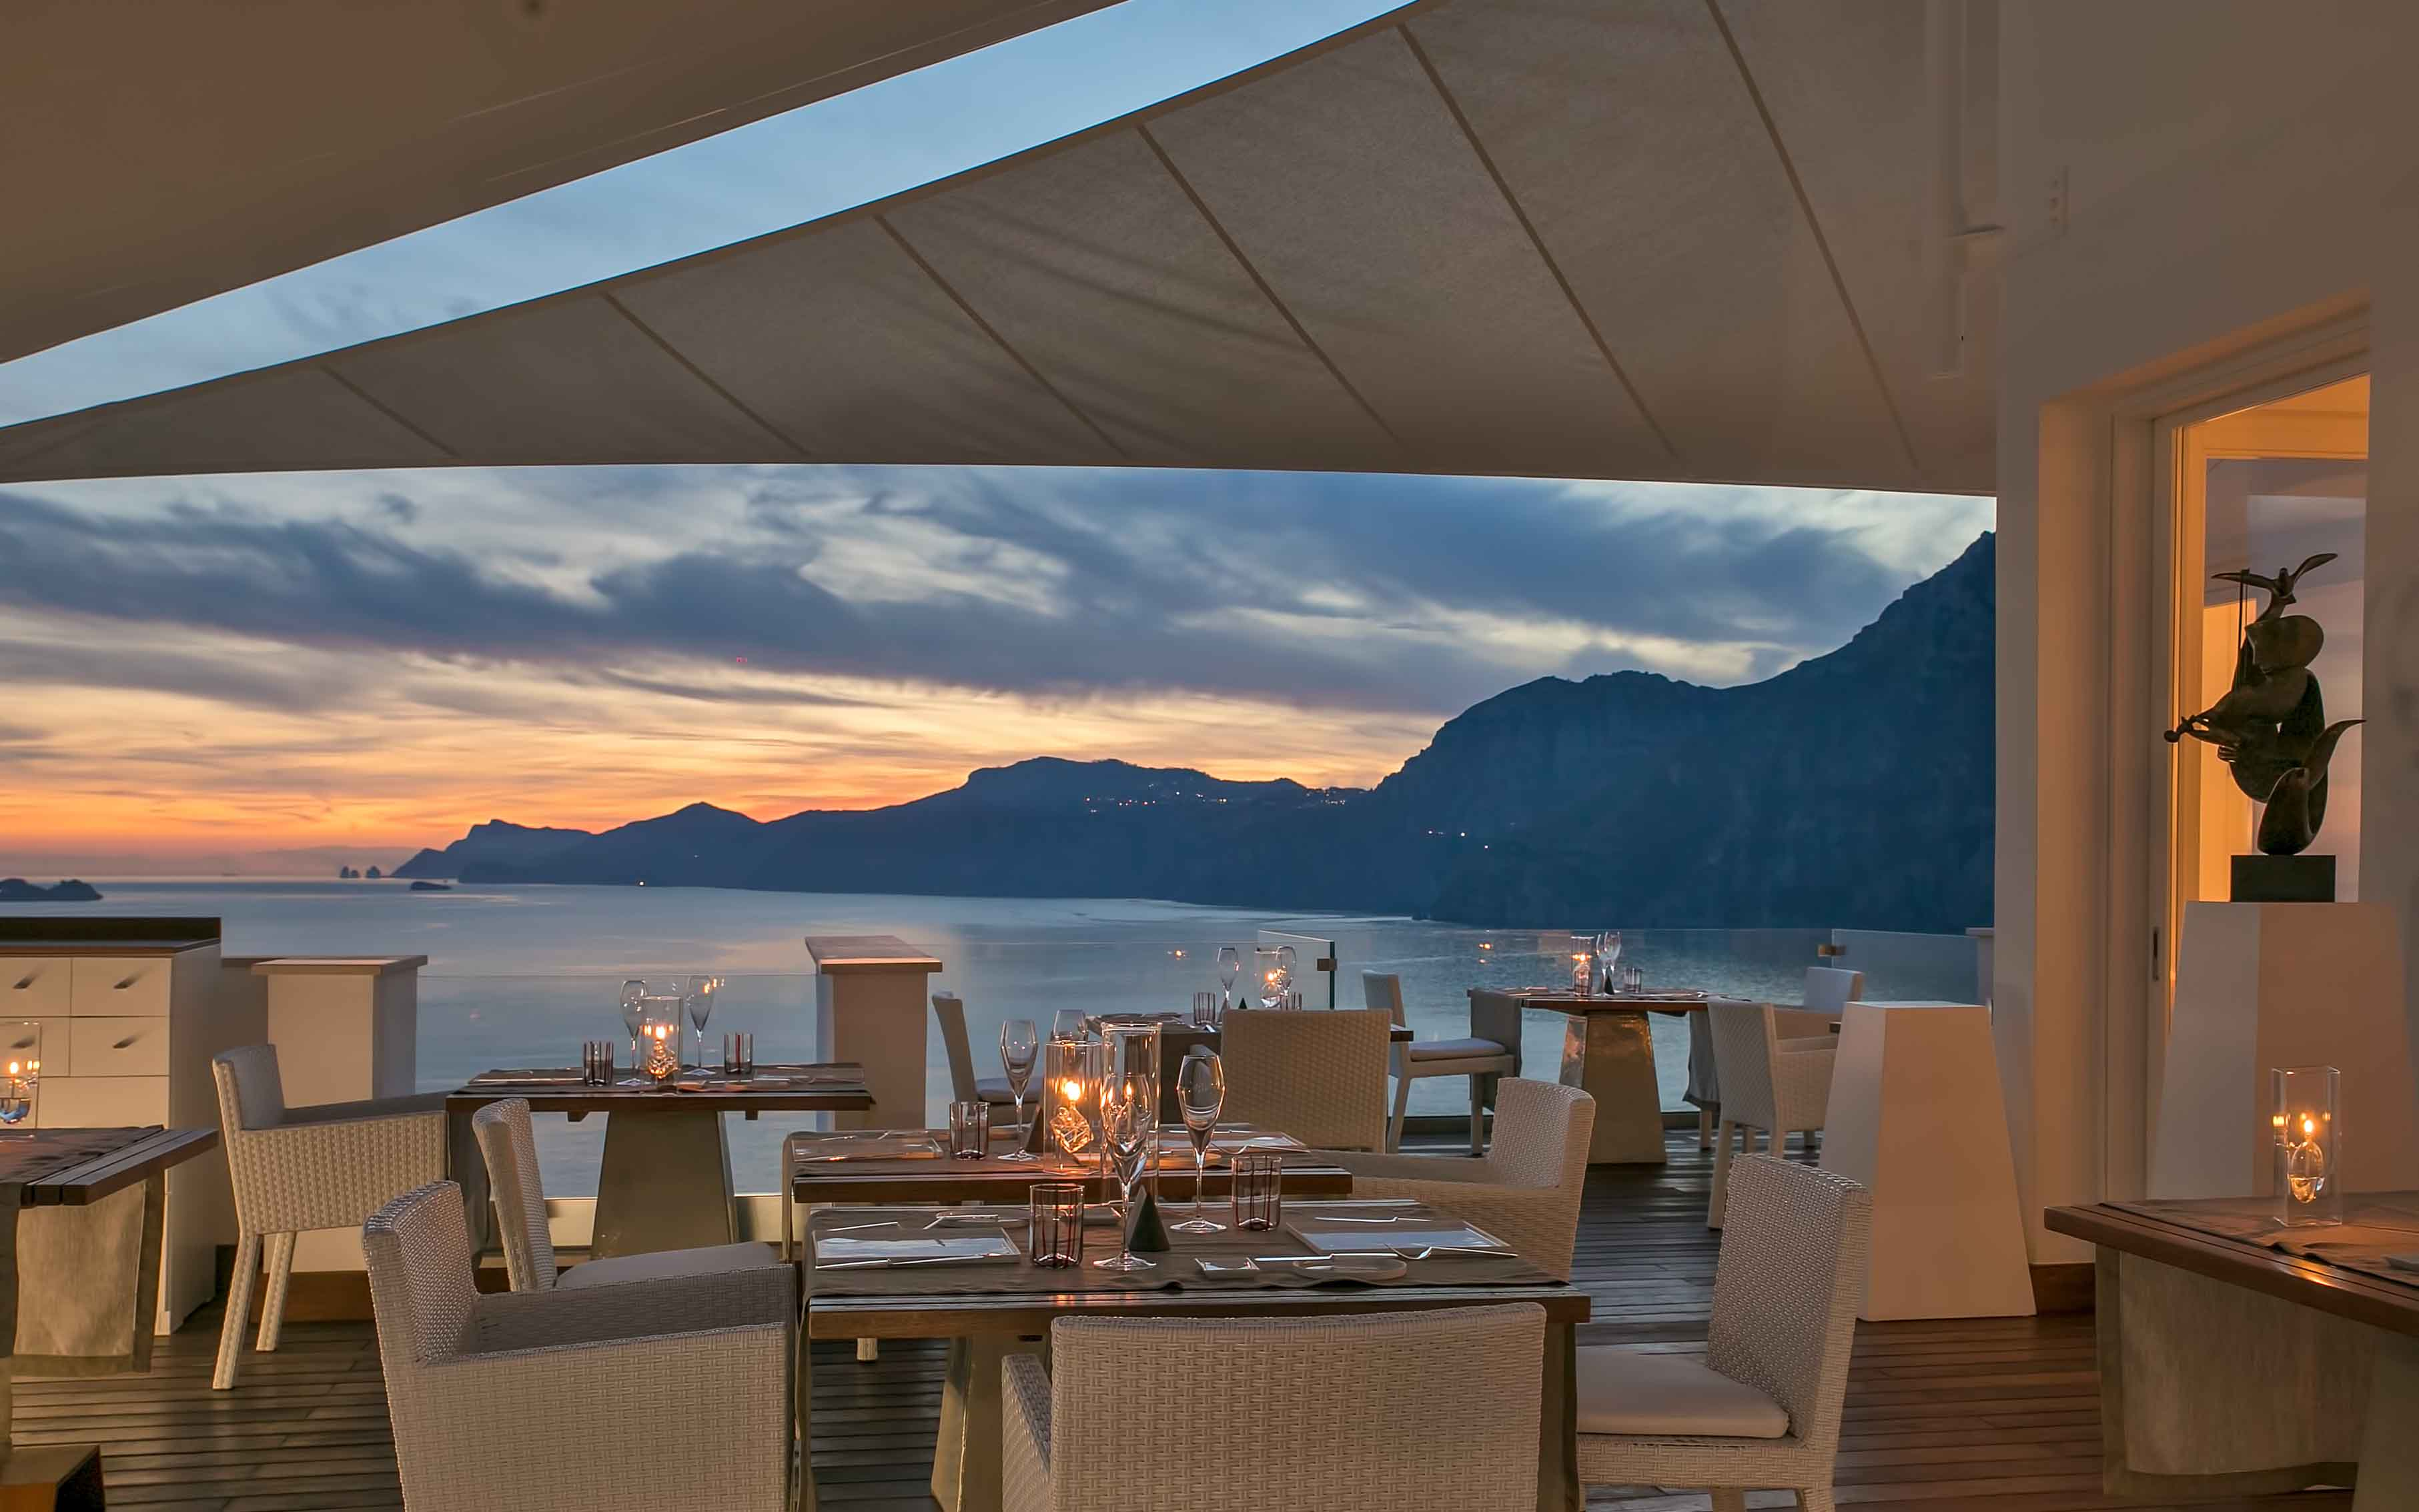 Restaurant by Night at Casa Angelina